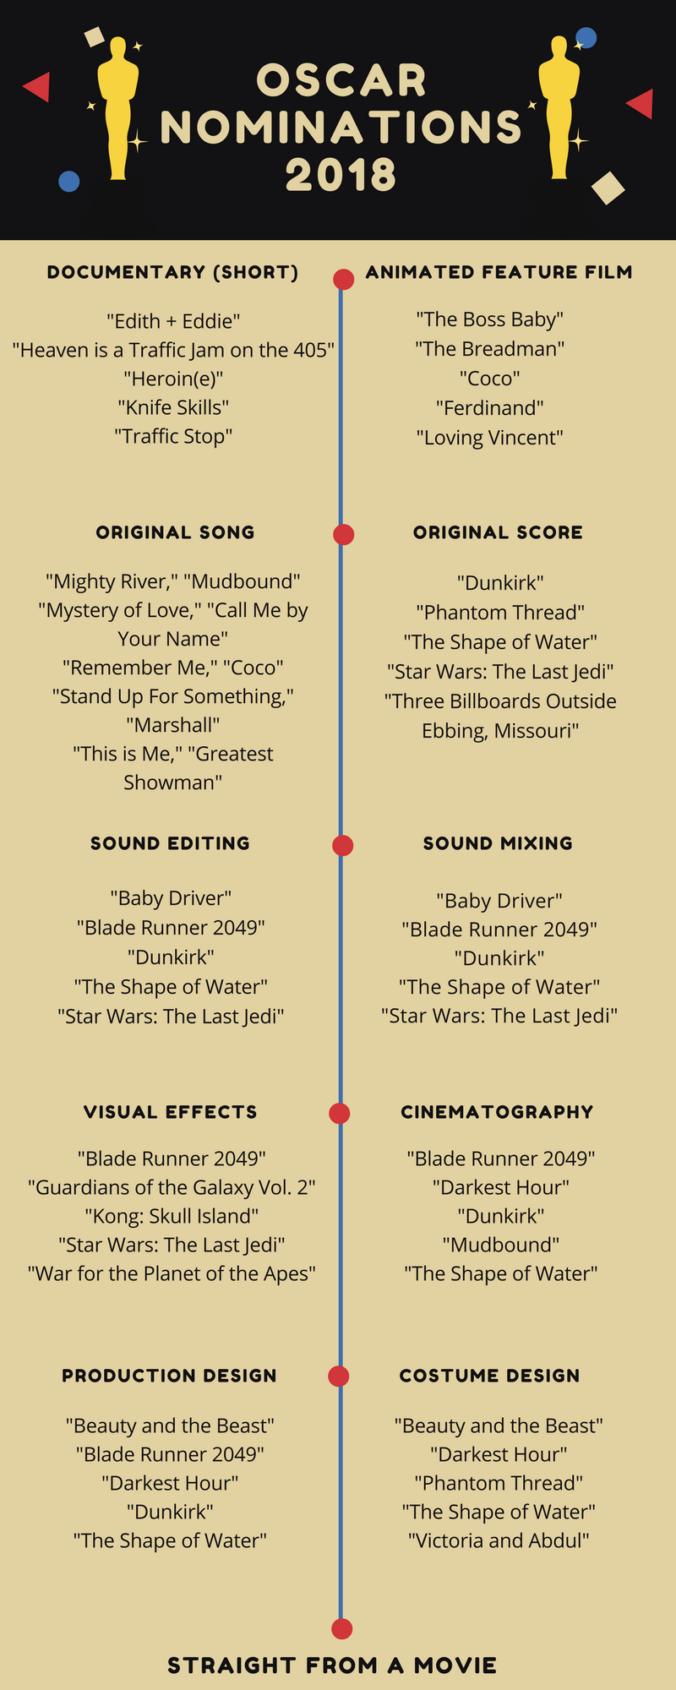 Oscar Award Nominations 2018